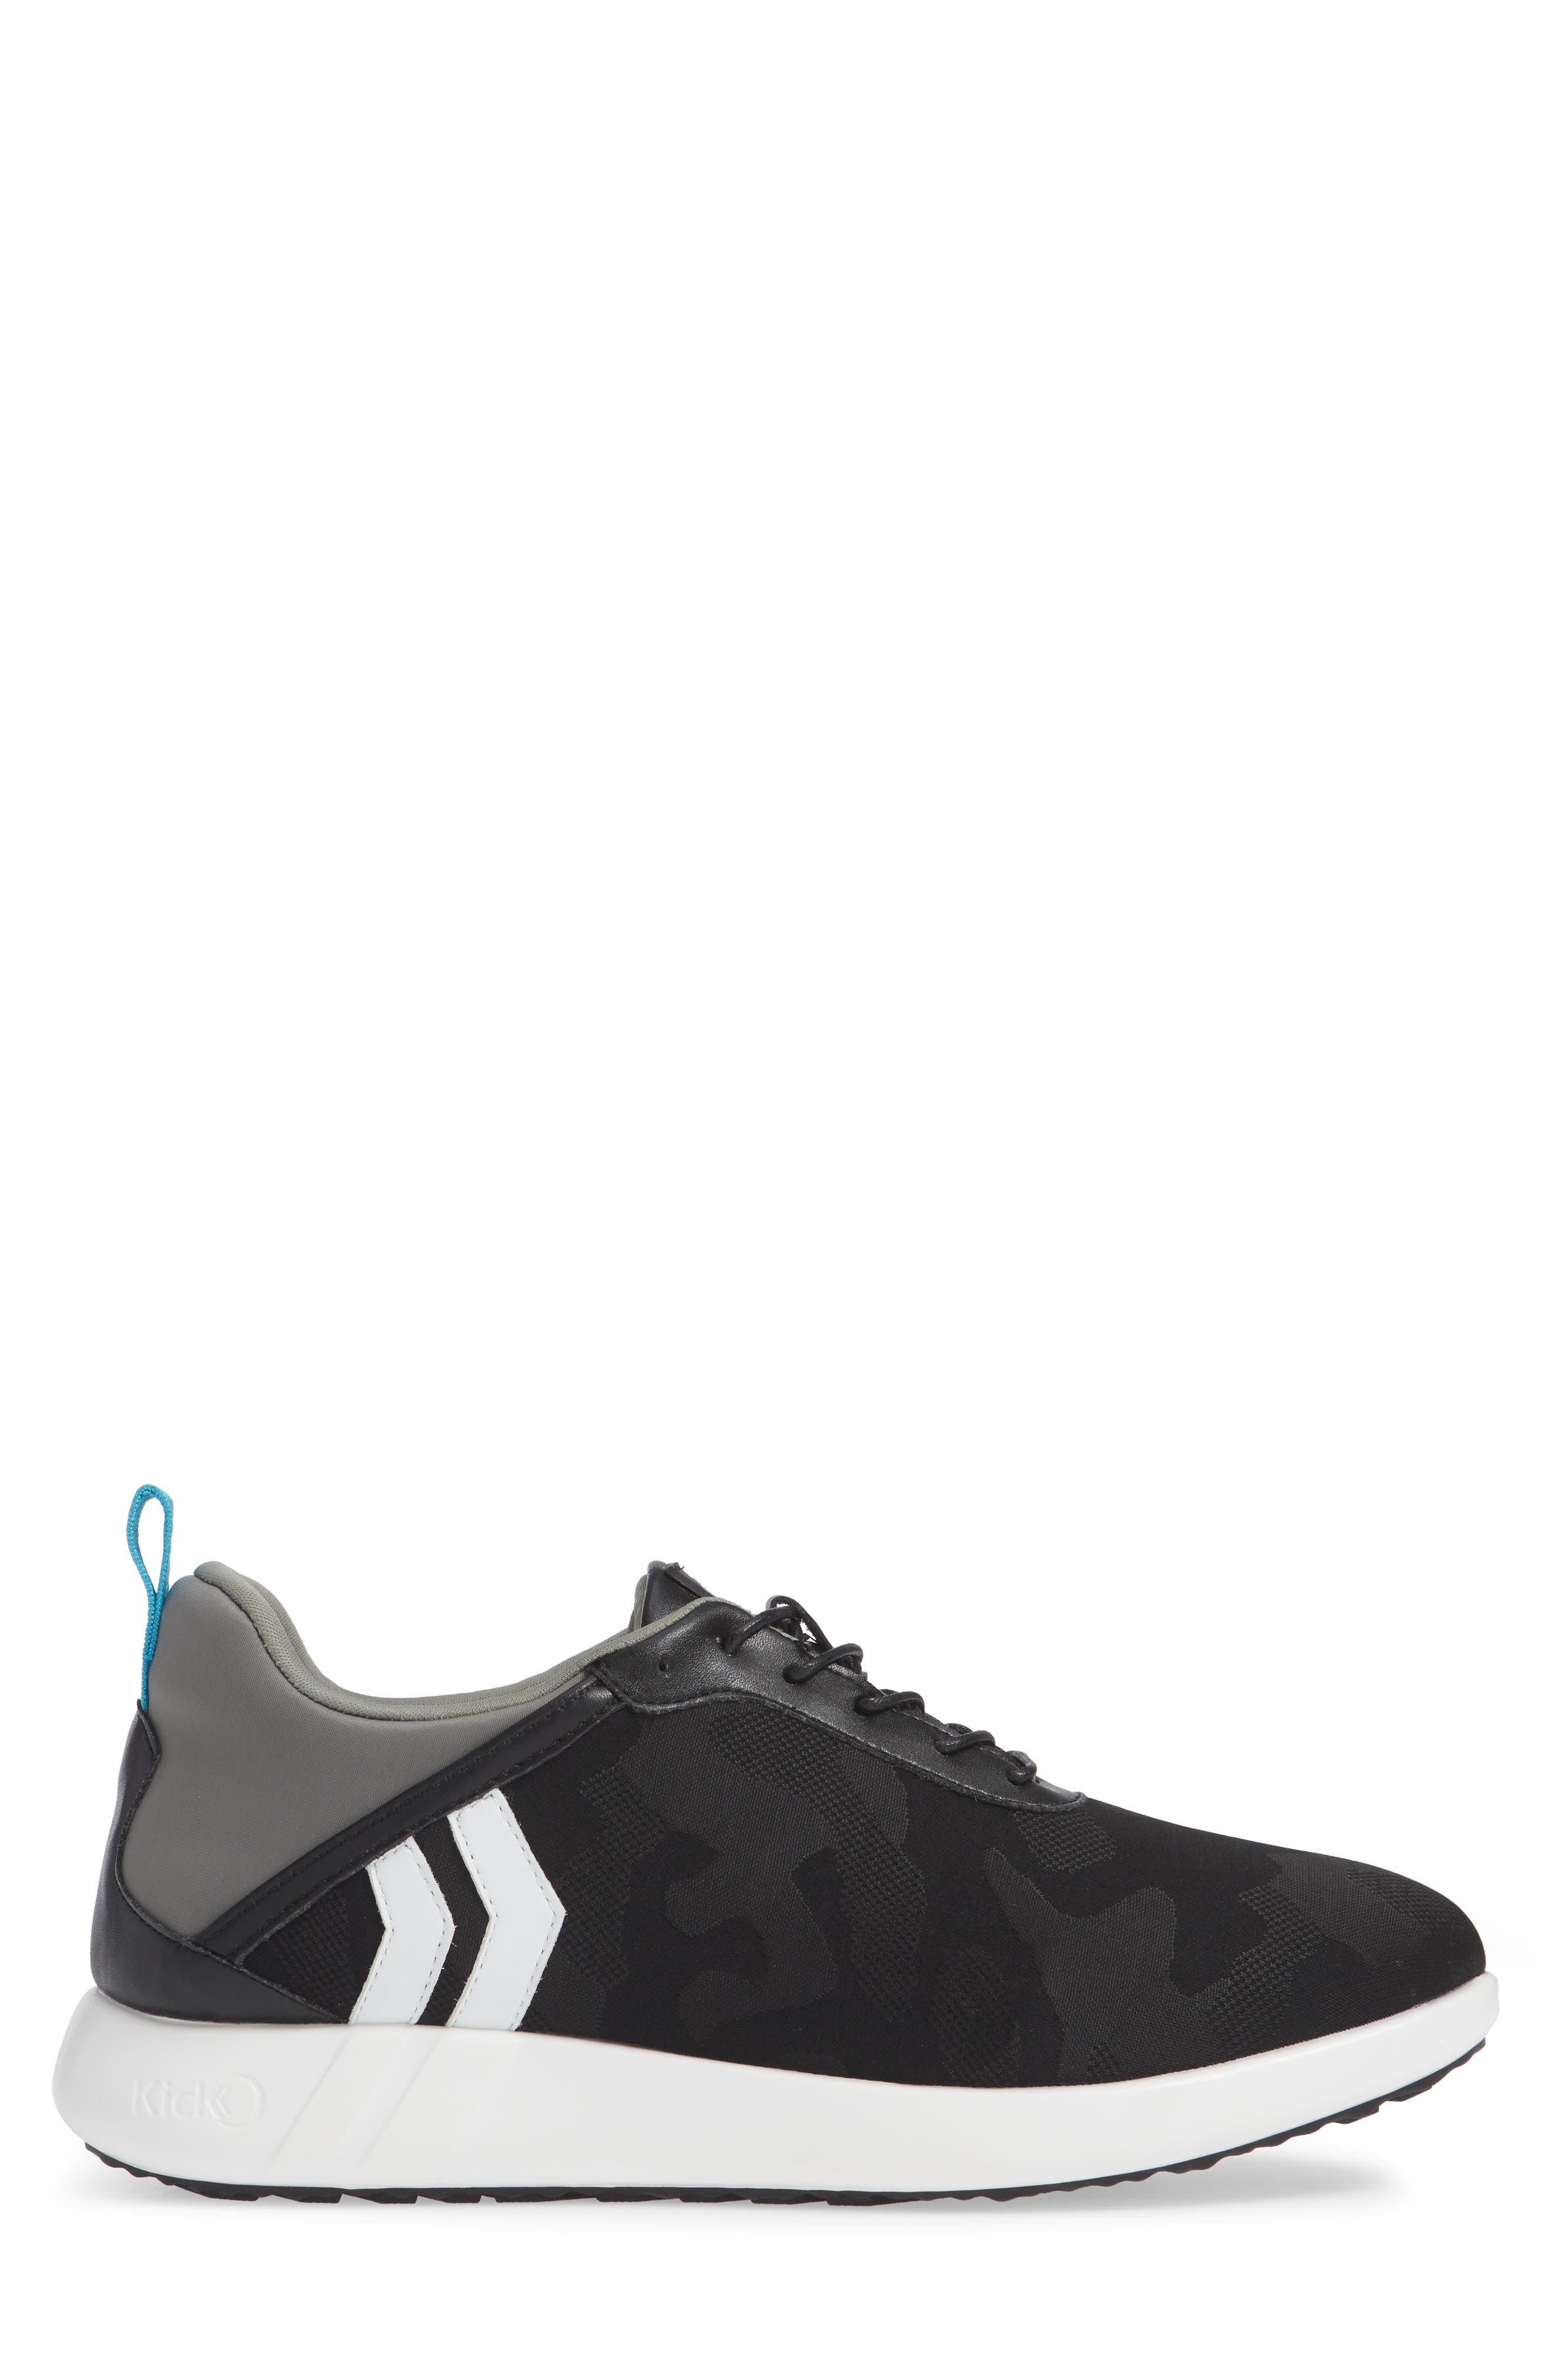 Camo Sneaker,                             Alternate thumbnail 3, color,                             001